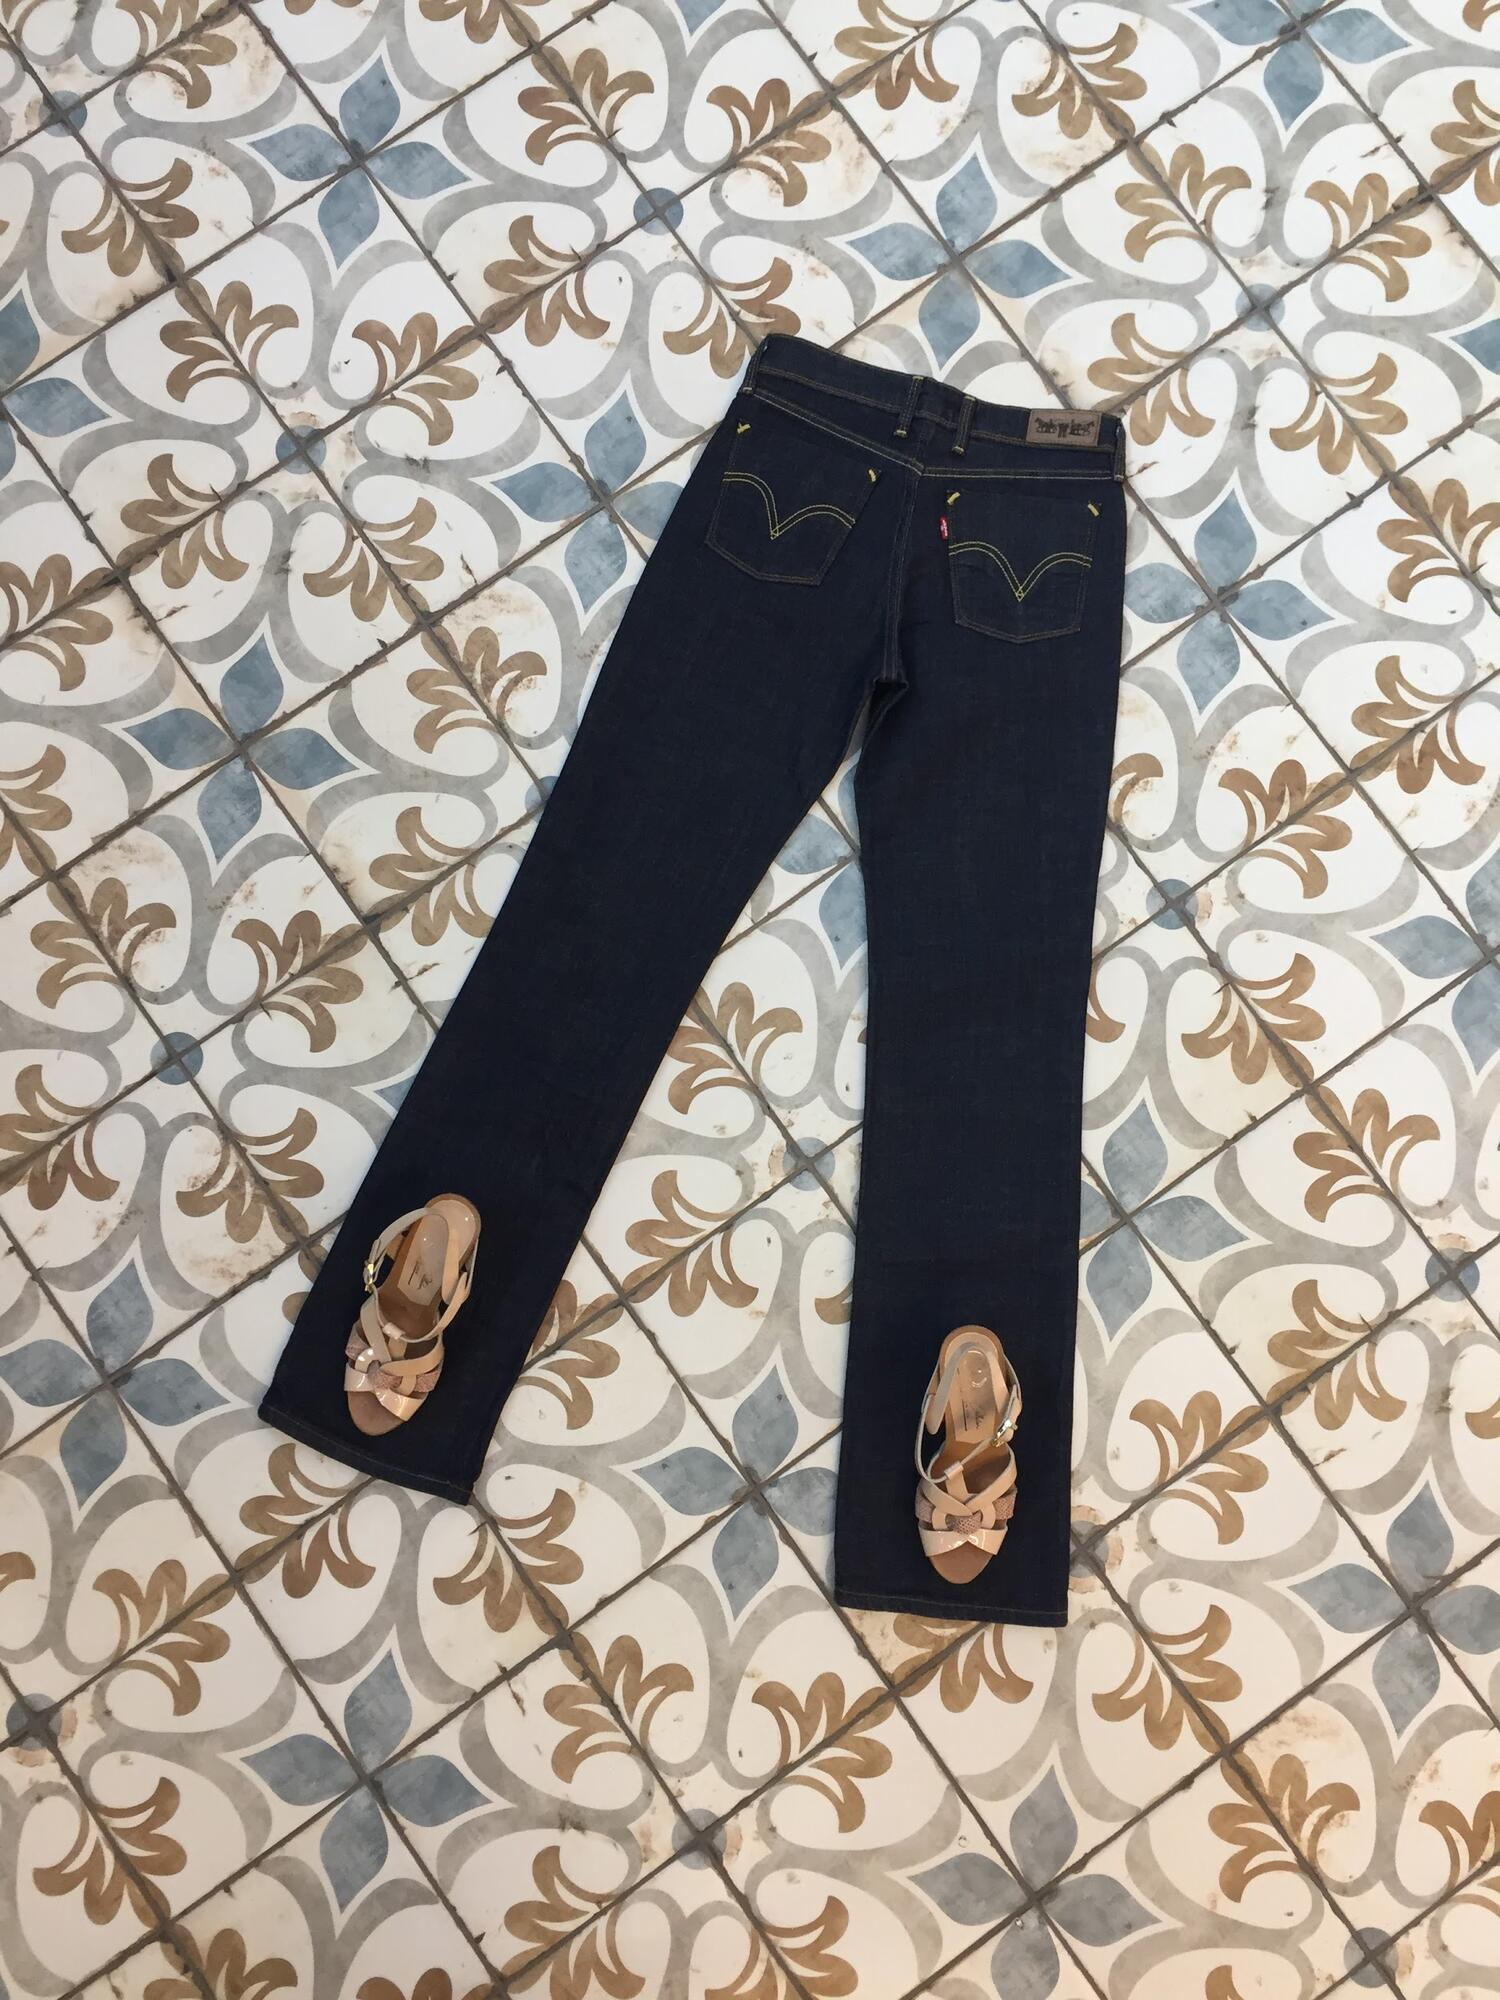 Spodnie LEVI'S 627 ciemny jeans - Vintage Store   JestemSlow.pl